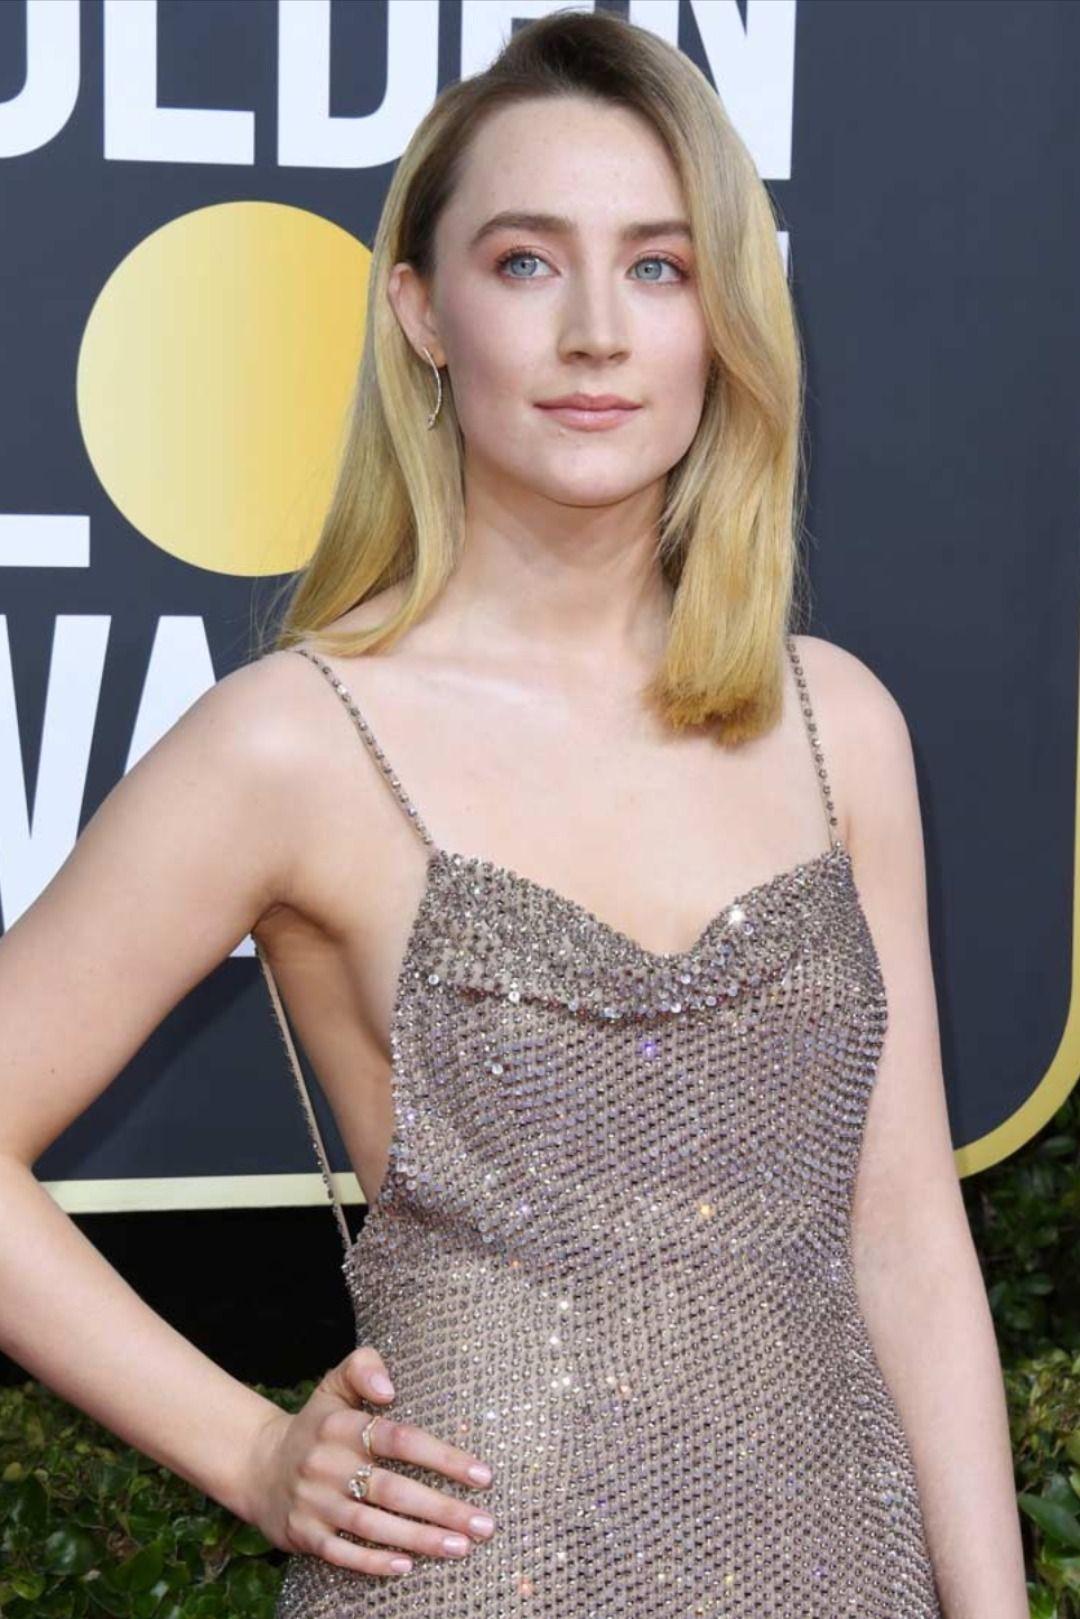 Saoirse Ronan Dazzles in Atelier Swarovski at the 2020 Golden Globes